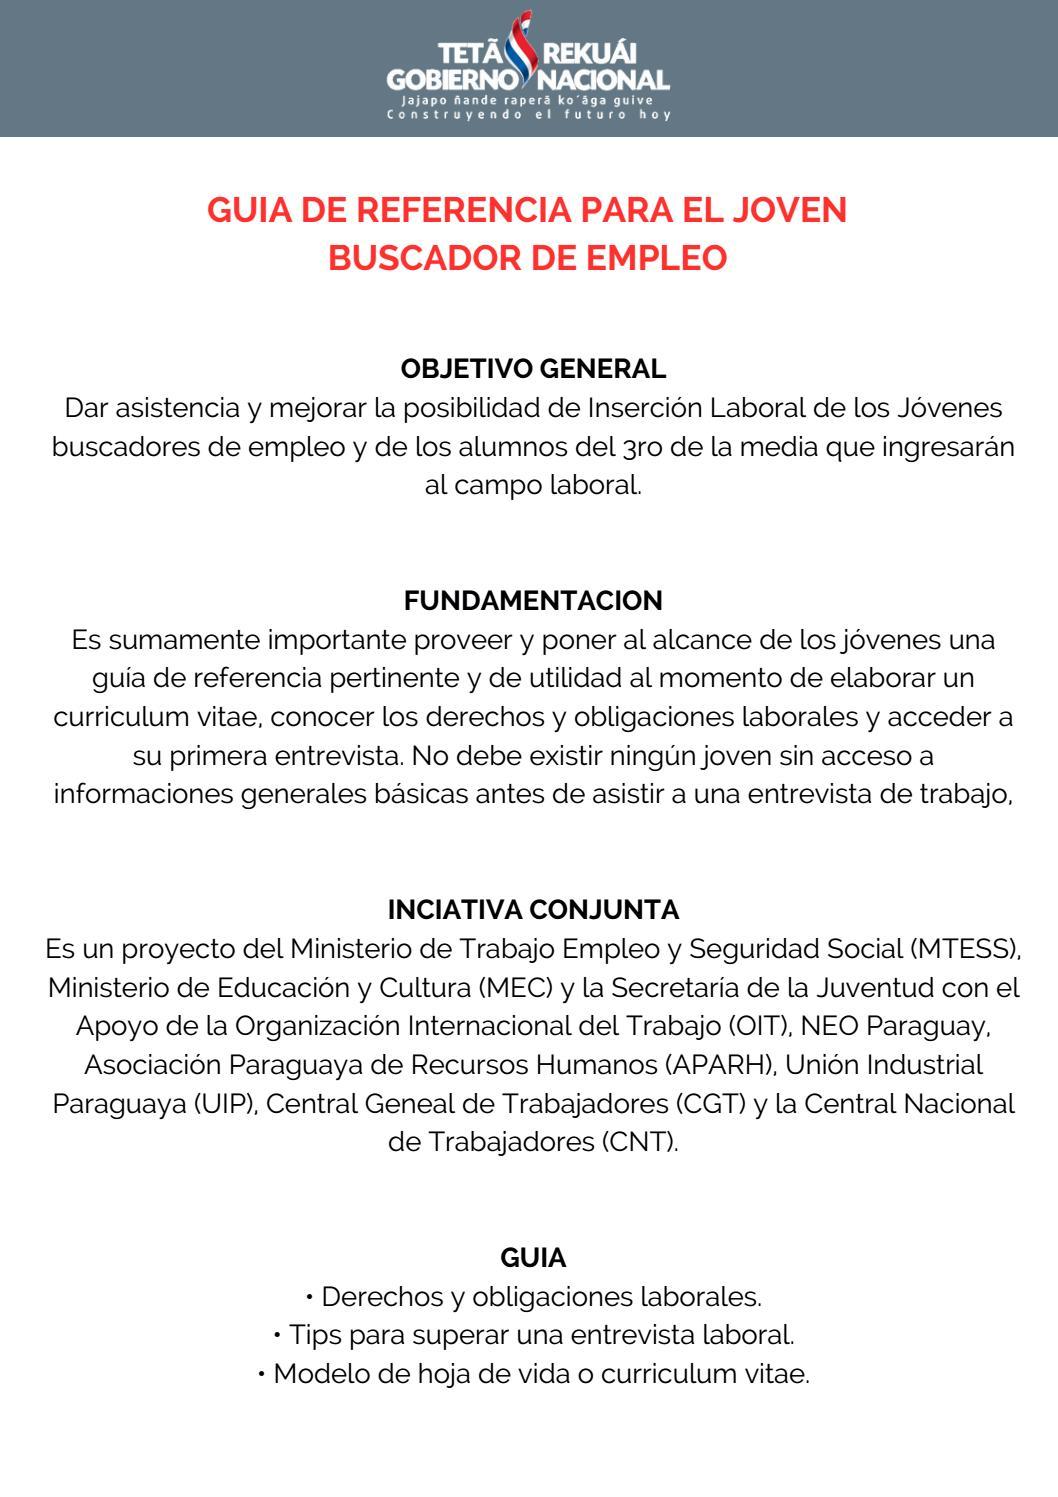 Guia busqueda empleo joven by Jorge Veron - issuu